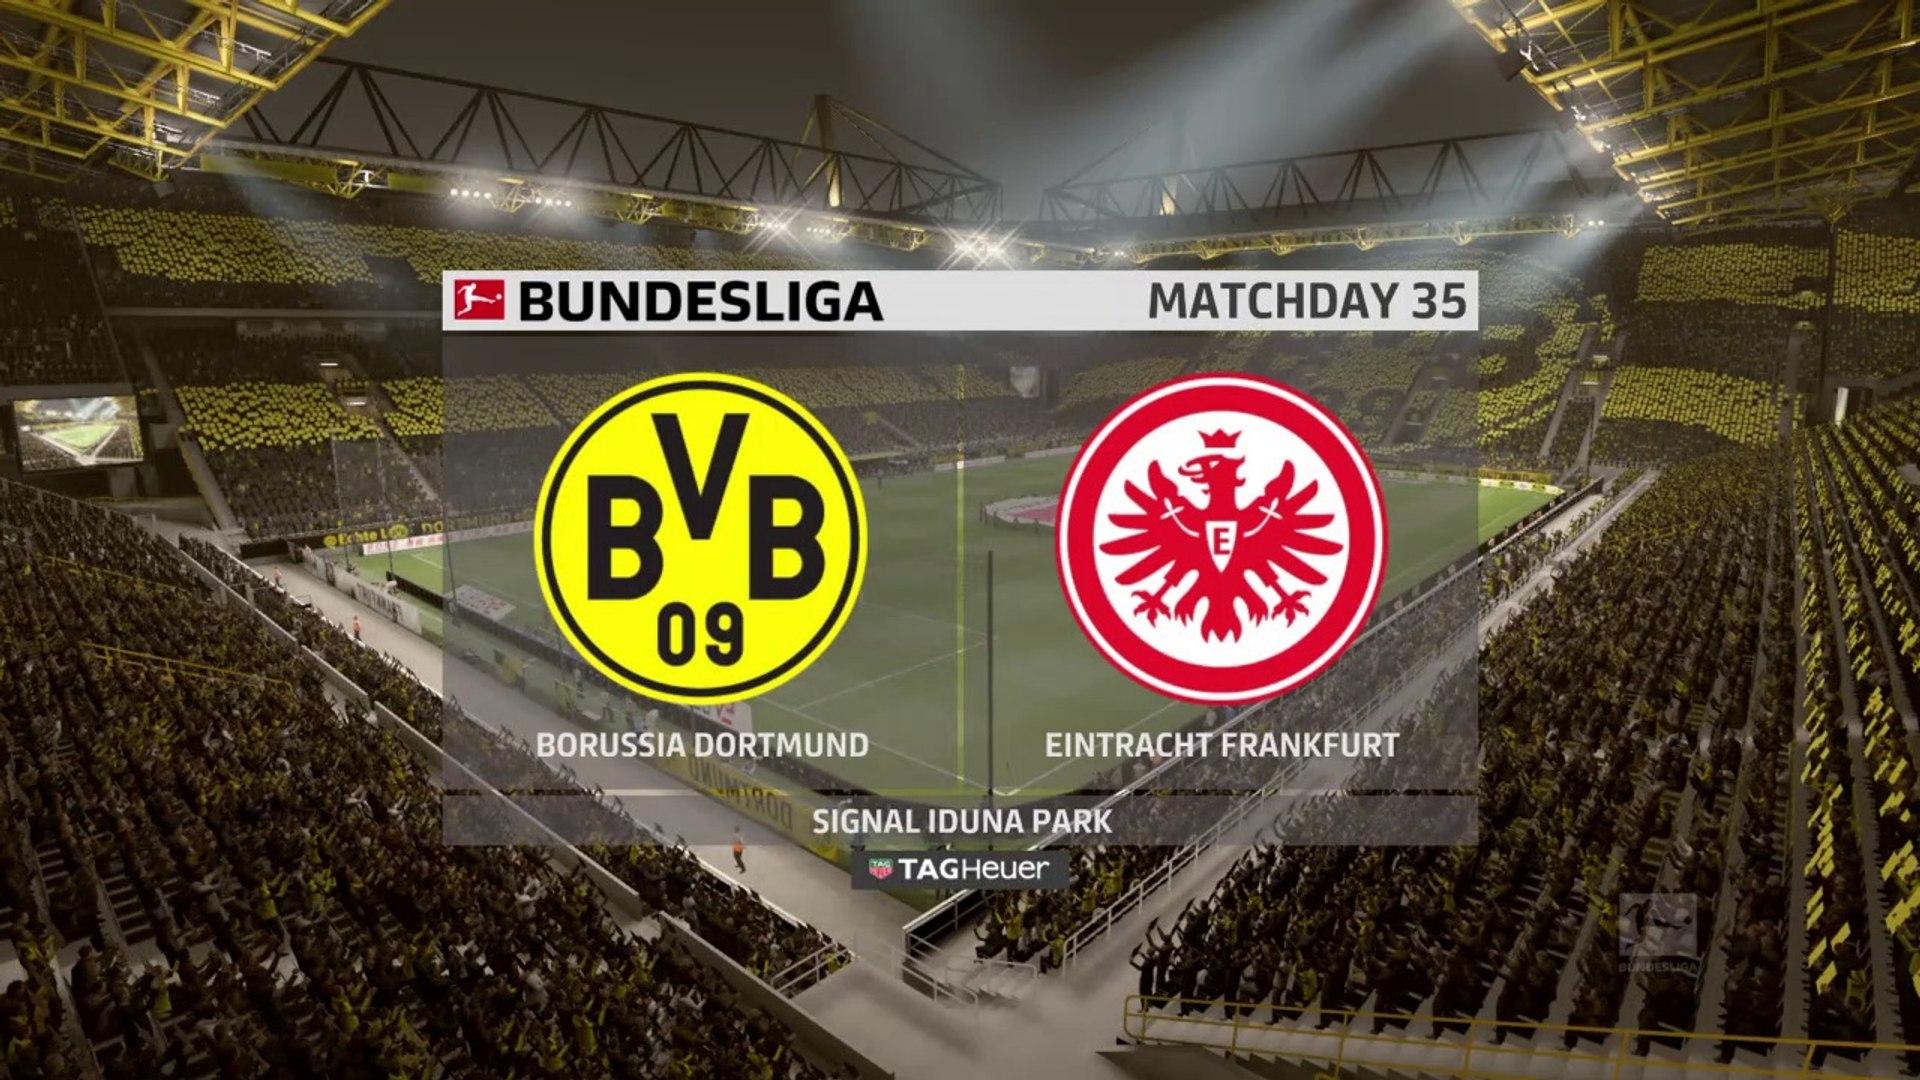 Borussia Dortmund vs Eintracht Frankfurt 2020- Bundesliga 2019-2020 HD FIFA